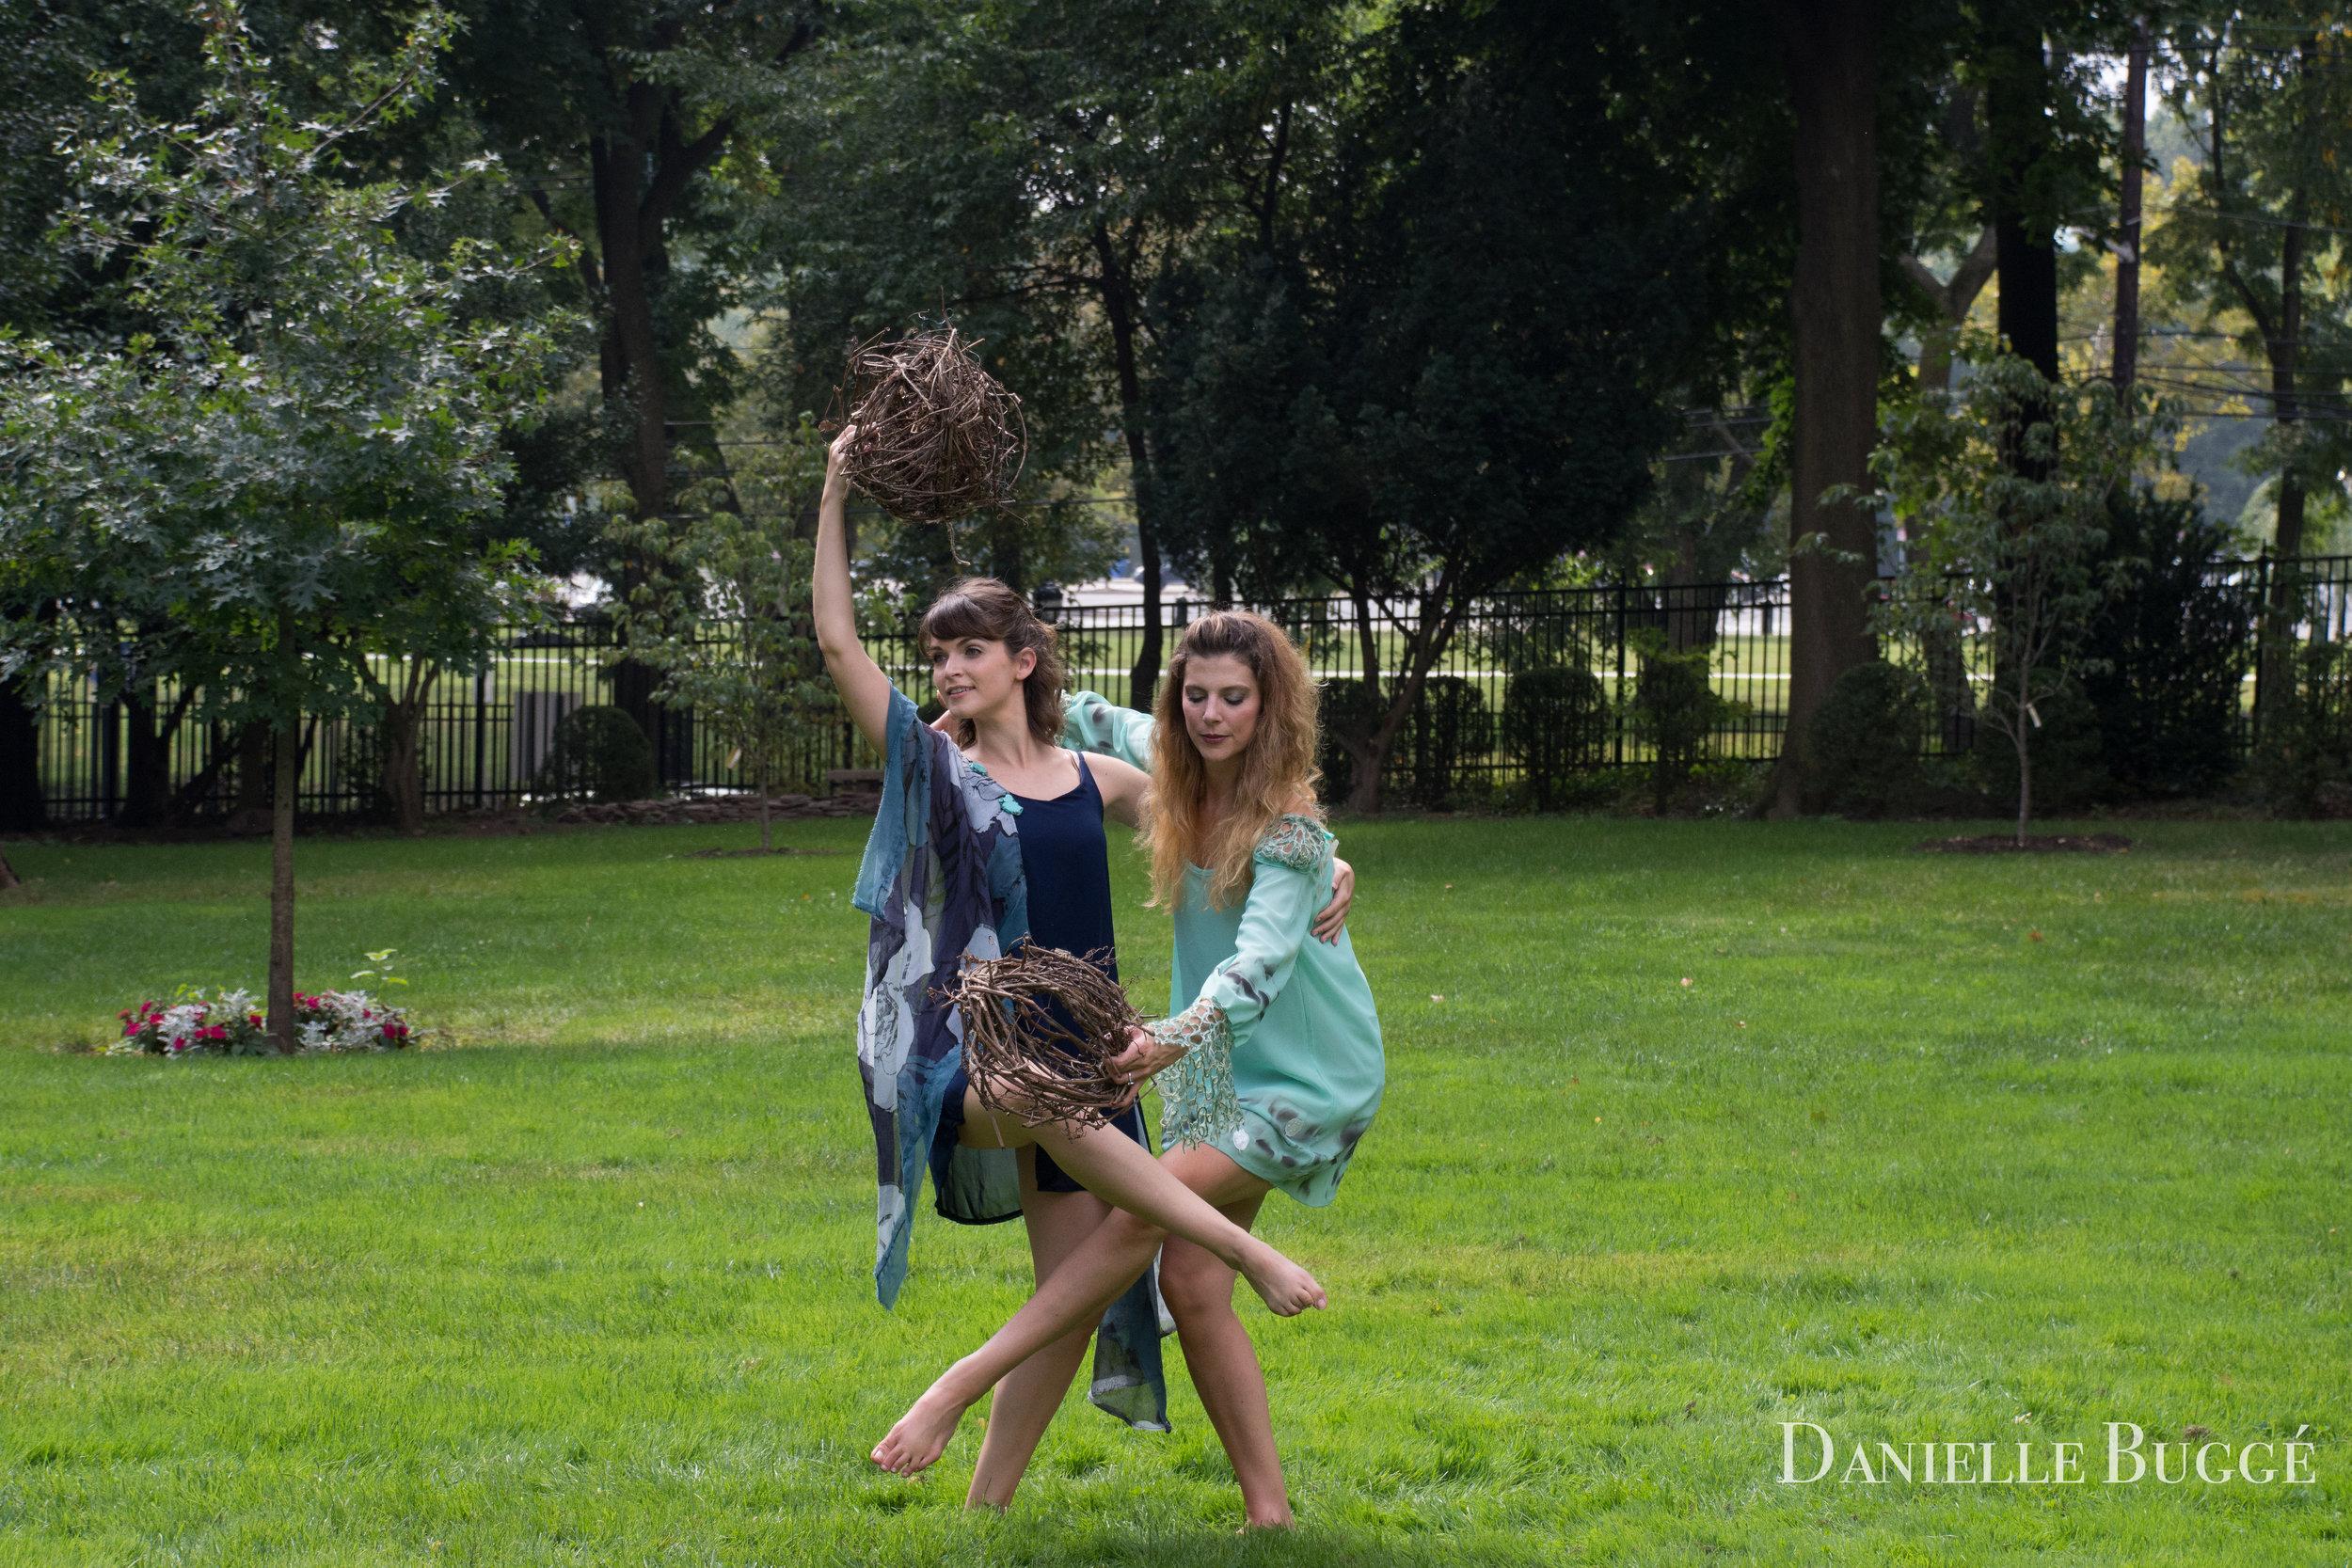 Nikki Manx Dance Project. Photography by Danielle Buggé